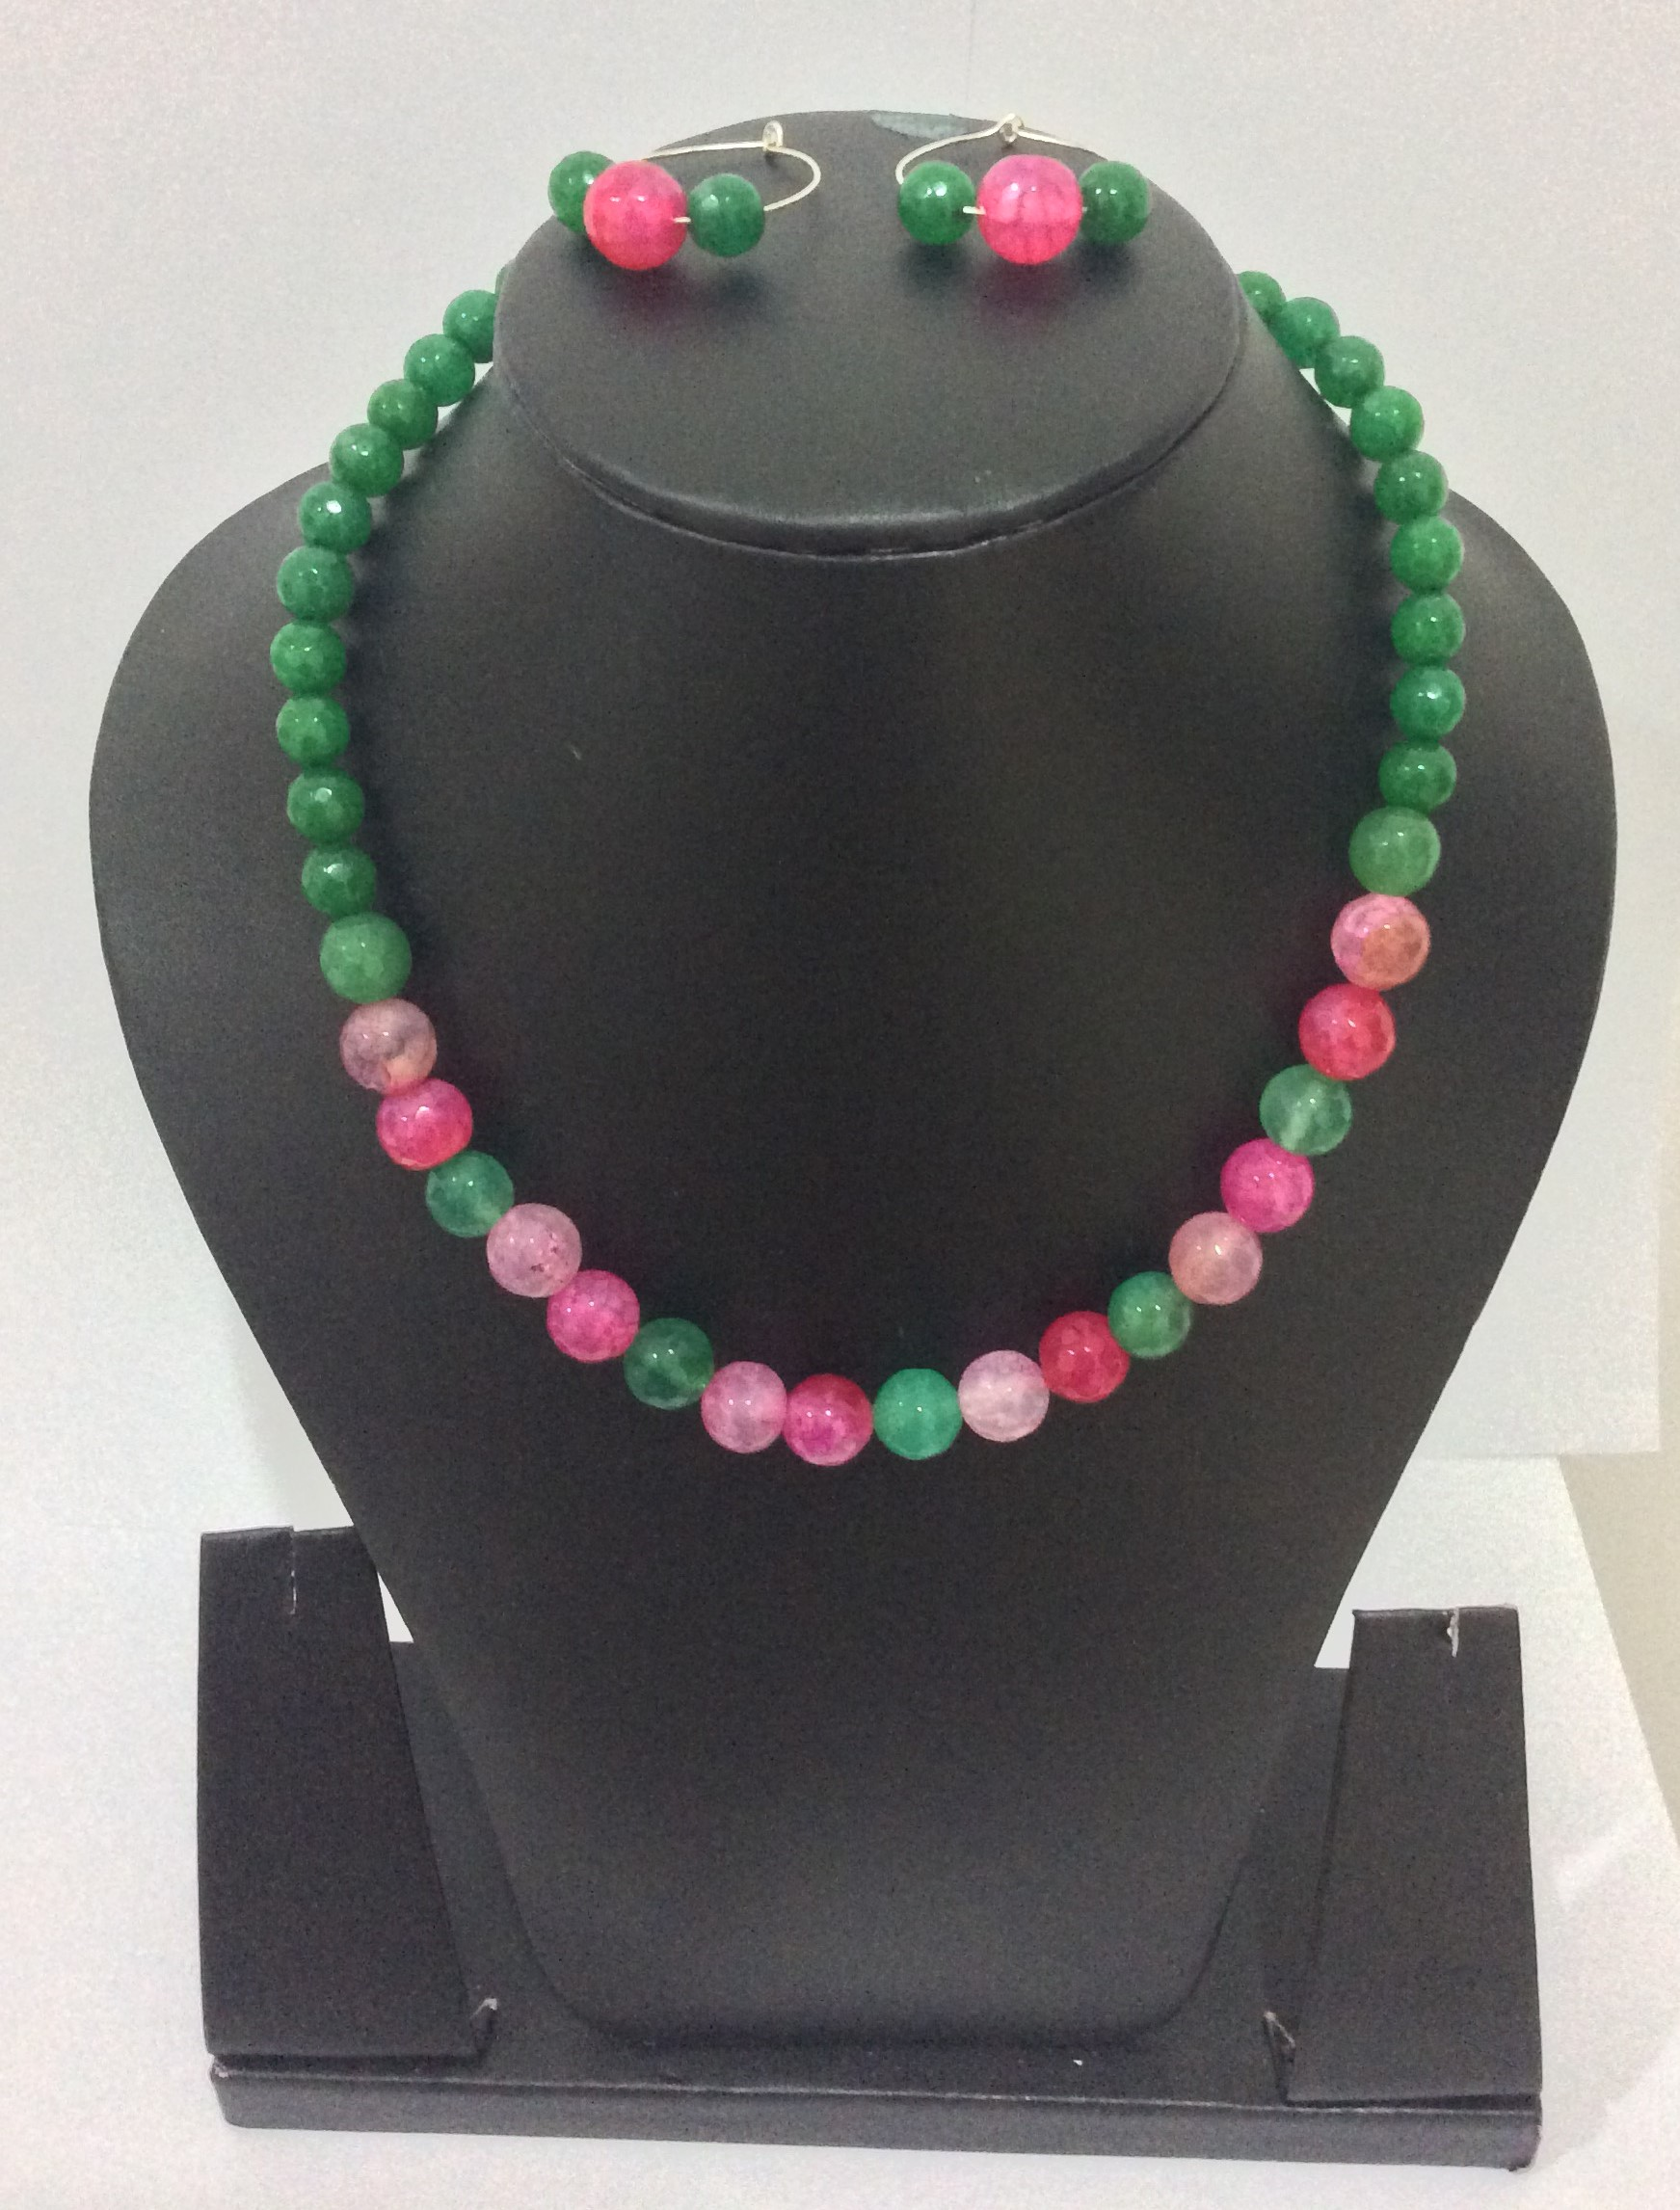 Finest Handmade Semi-Precious Bead Fashion Jewelry-02 | Tulasi Trendz UH89